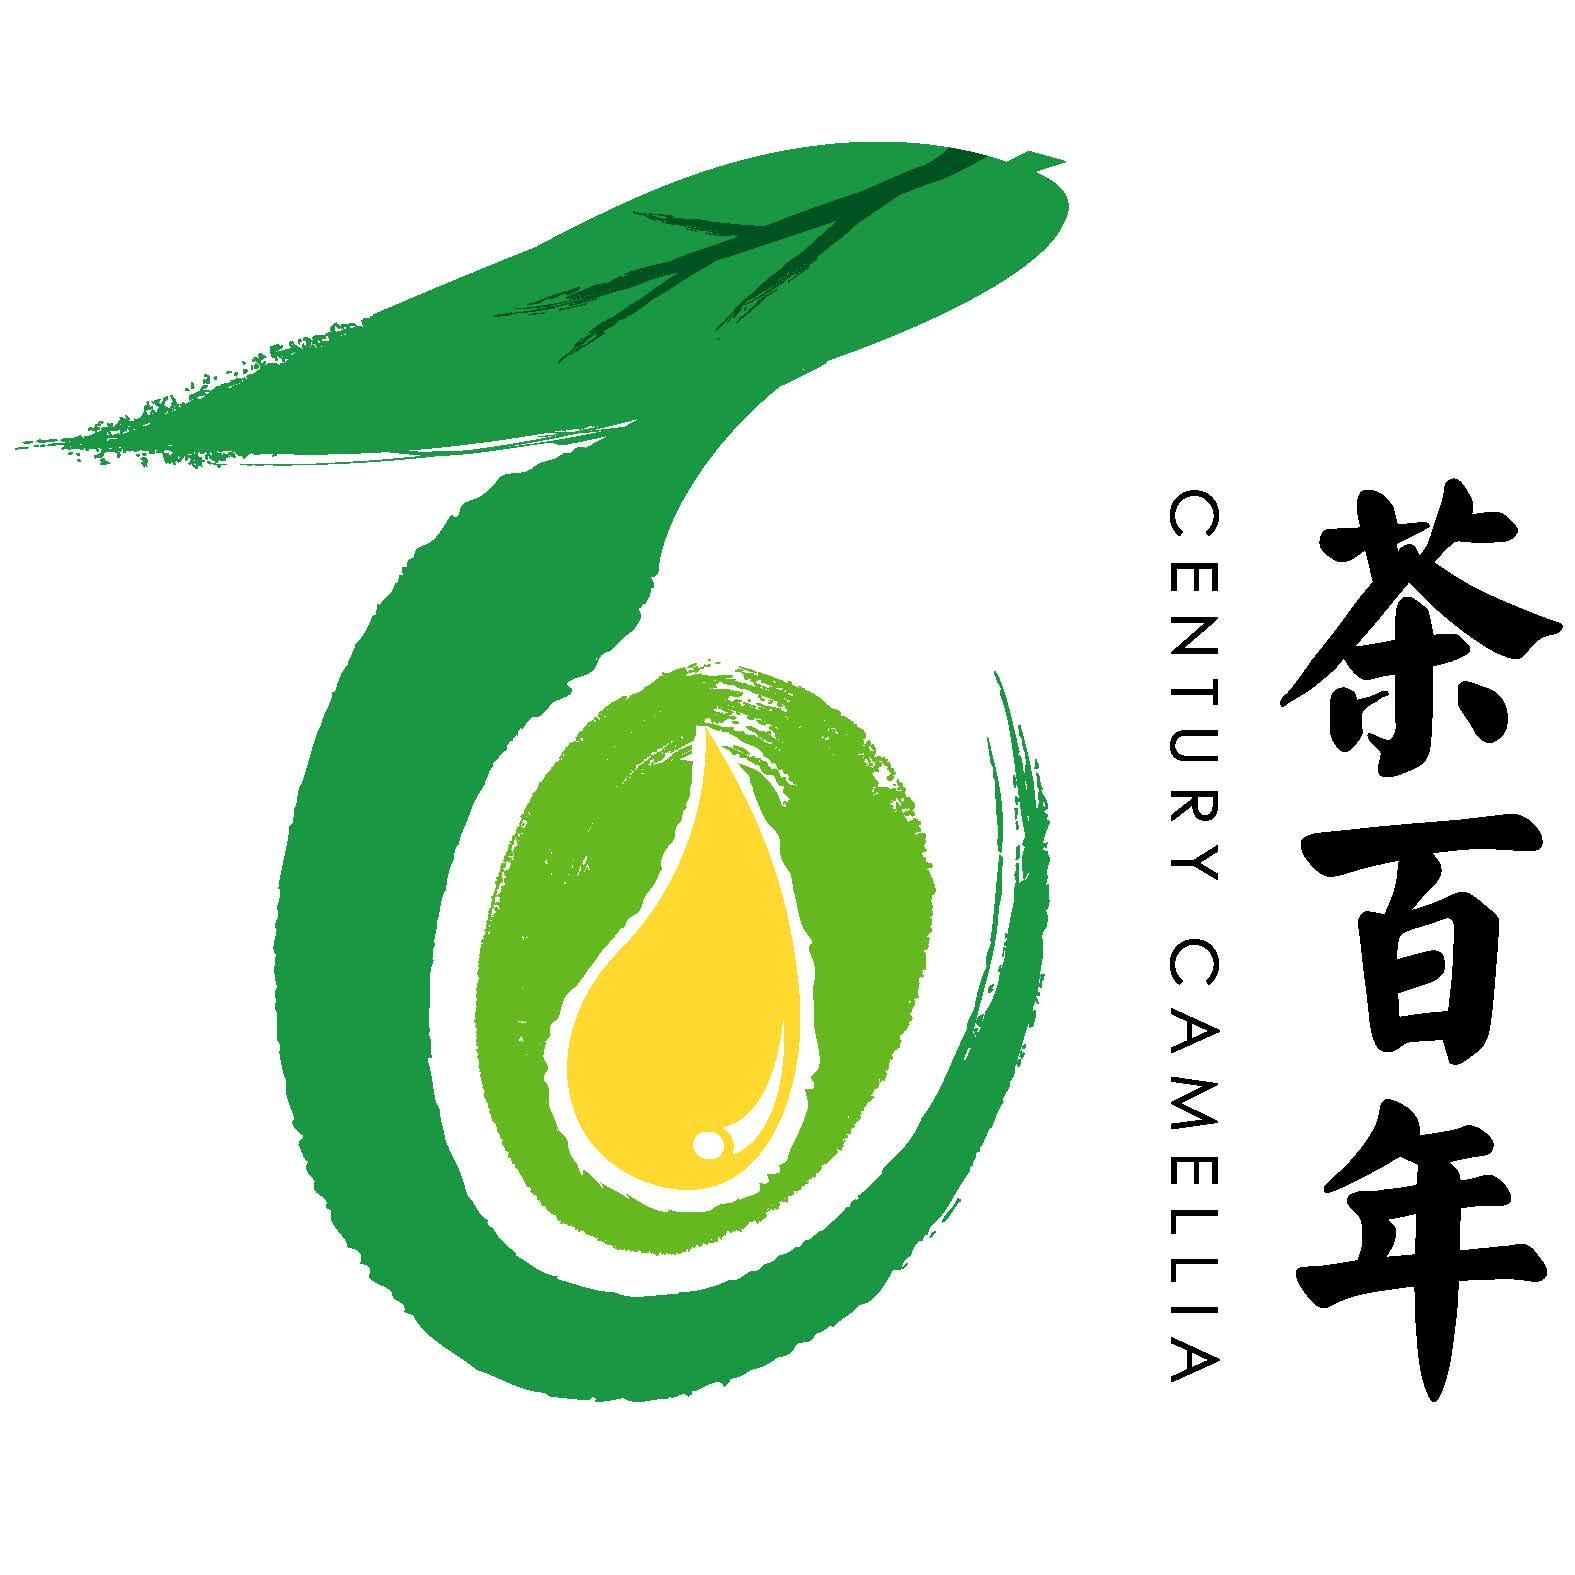 logo logo 标志 设计 图标 1575_1575图片